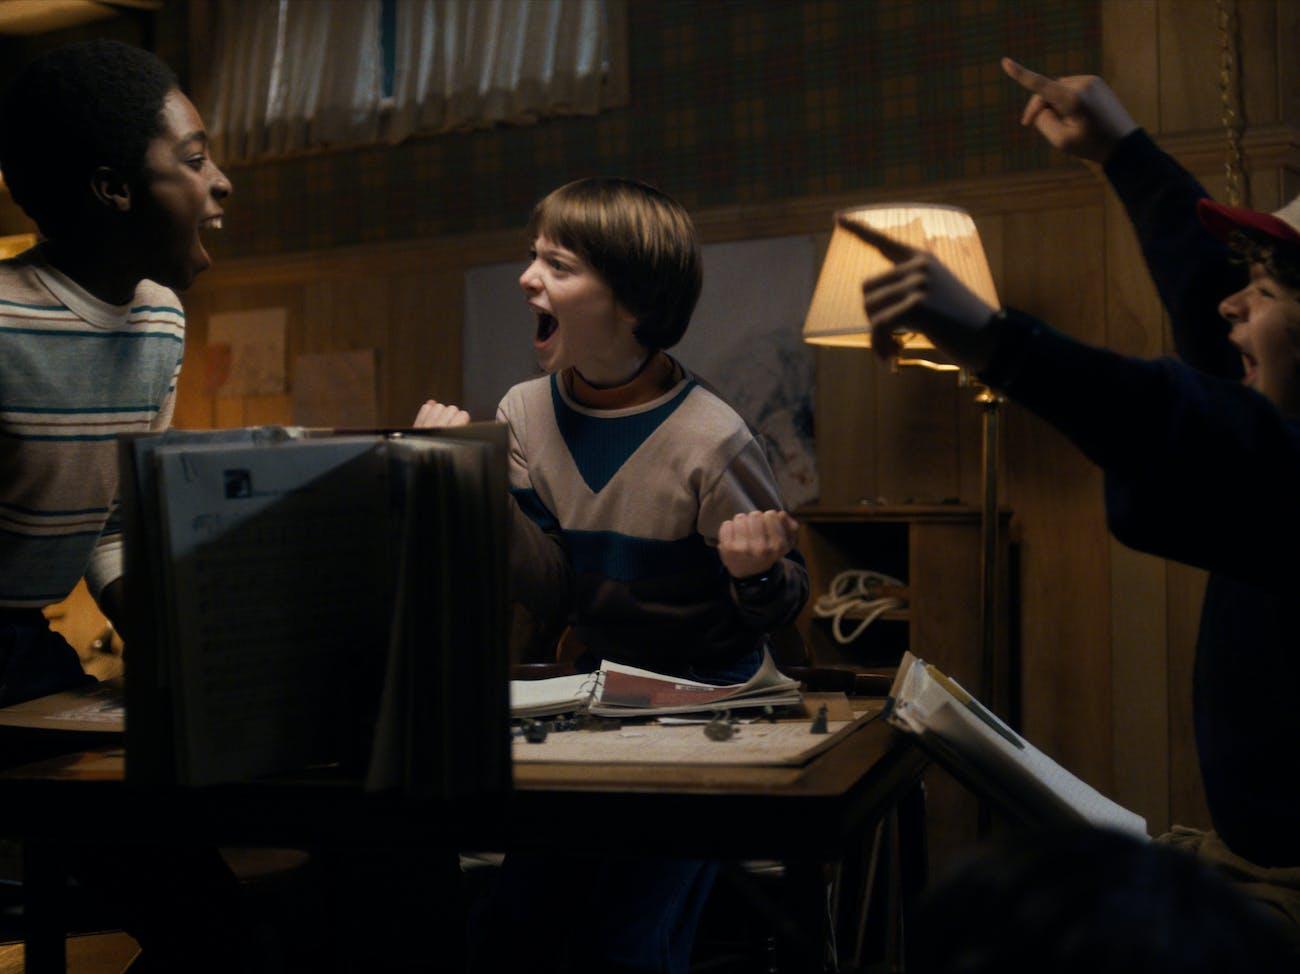 Stranger Things' Season 3 Trailer, Release Date, Spoilers